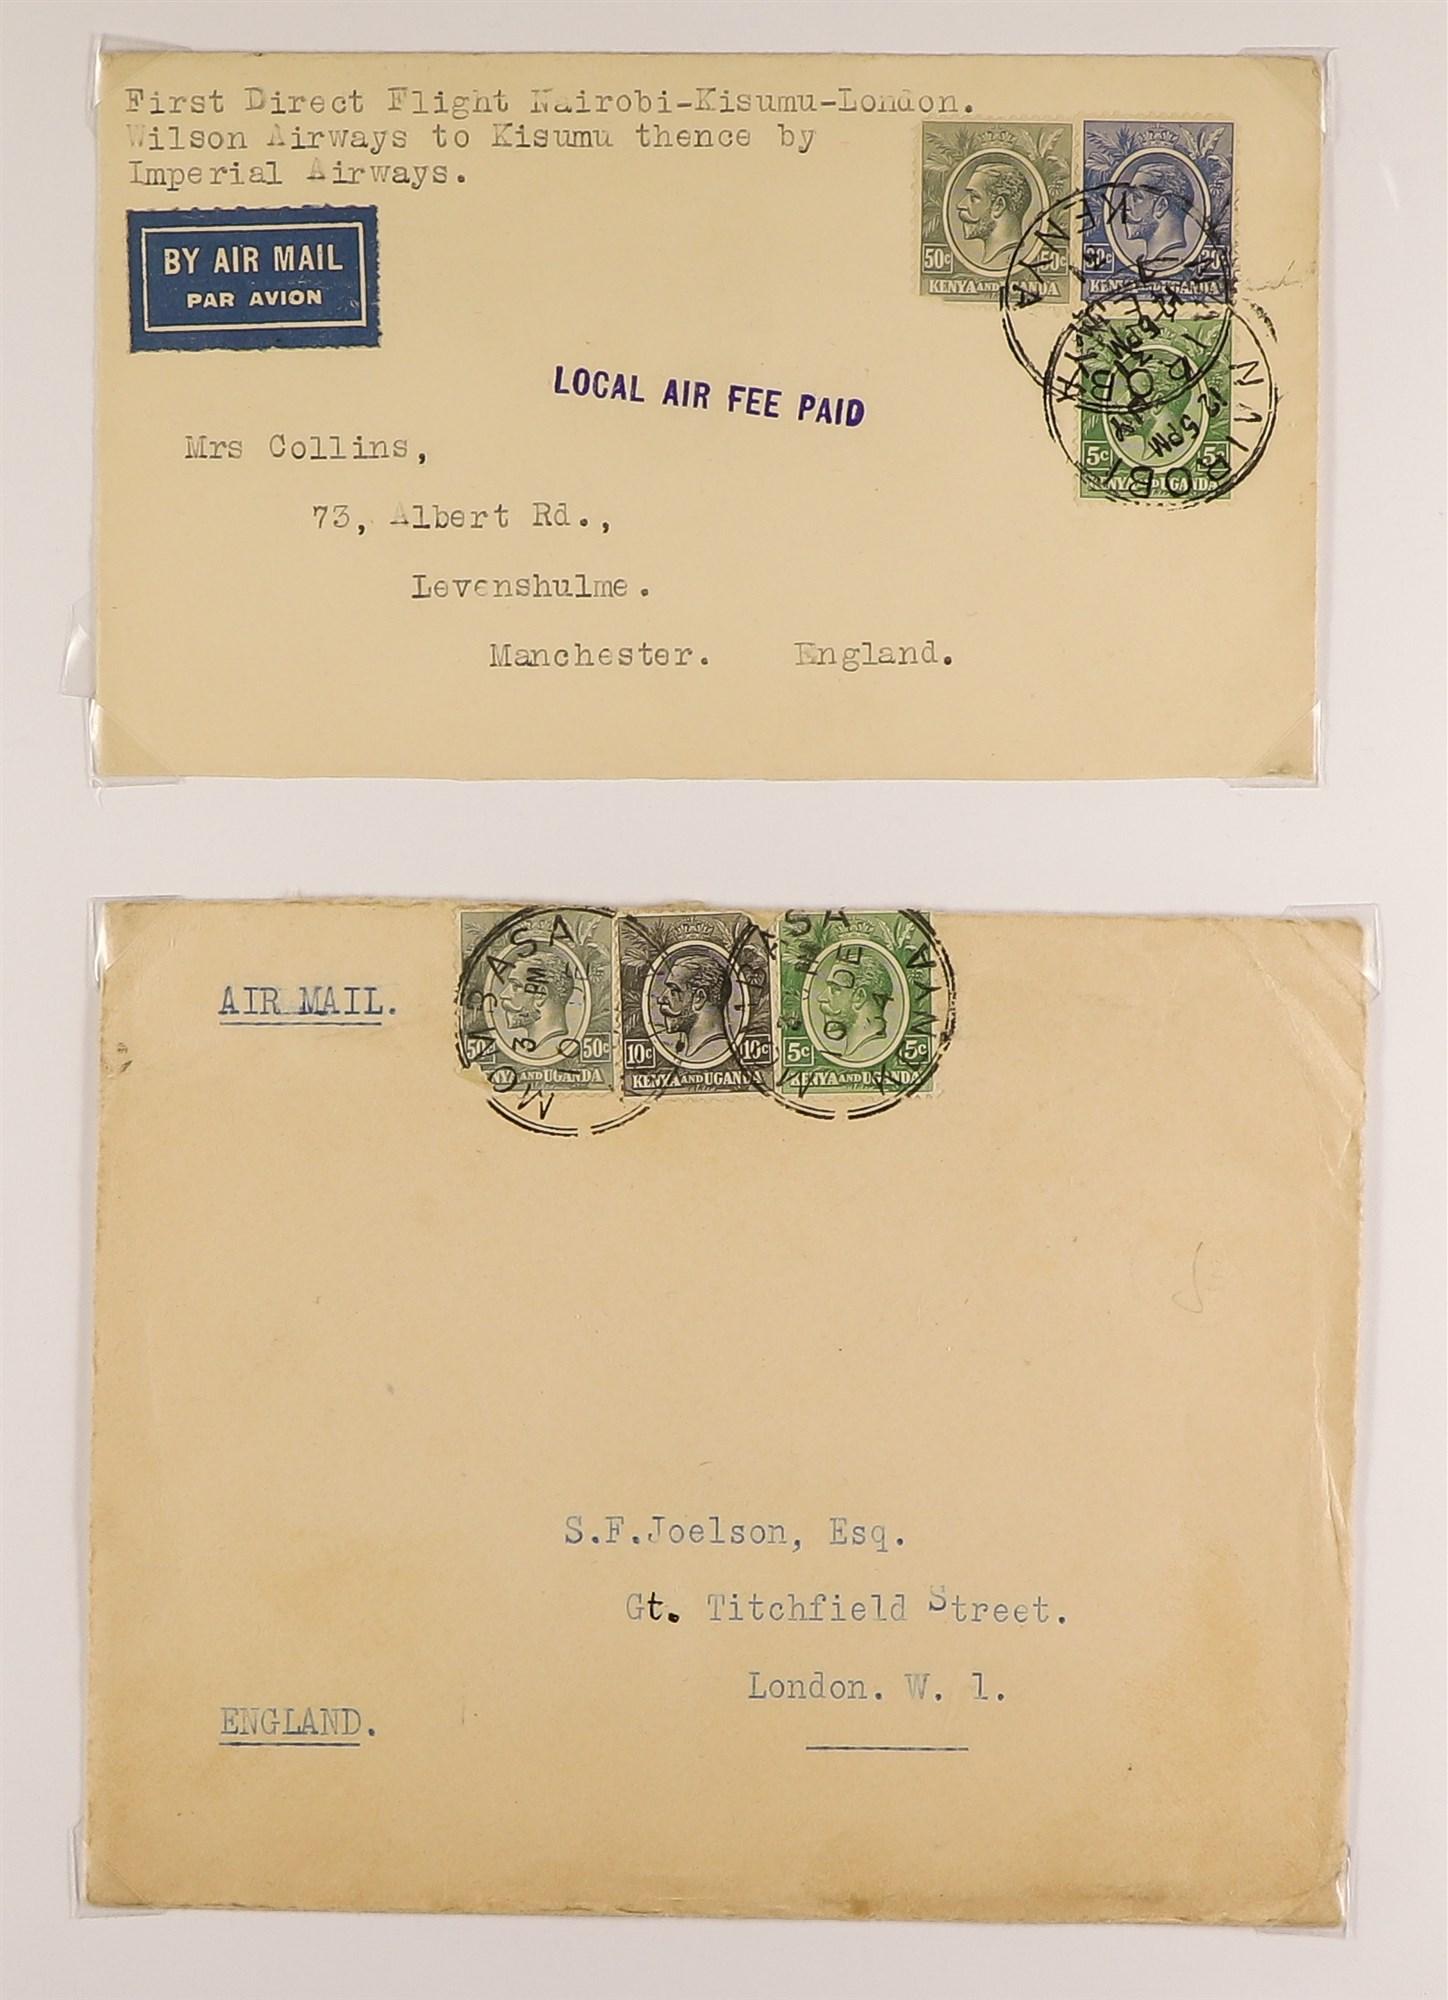 K.U.T. 1927-36 AIRMAIL COVERS COLLECTION incl. 1927 Kenya-Sudan, 1931 Christmas Flight, 1931